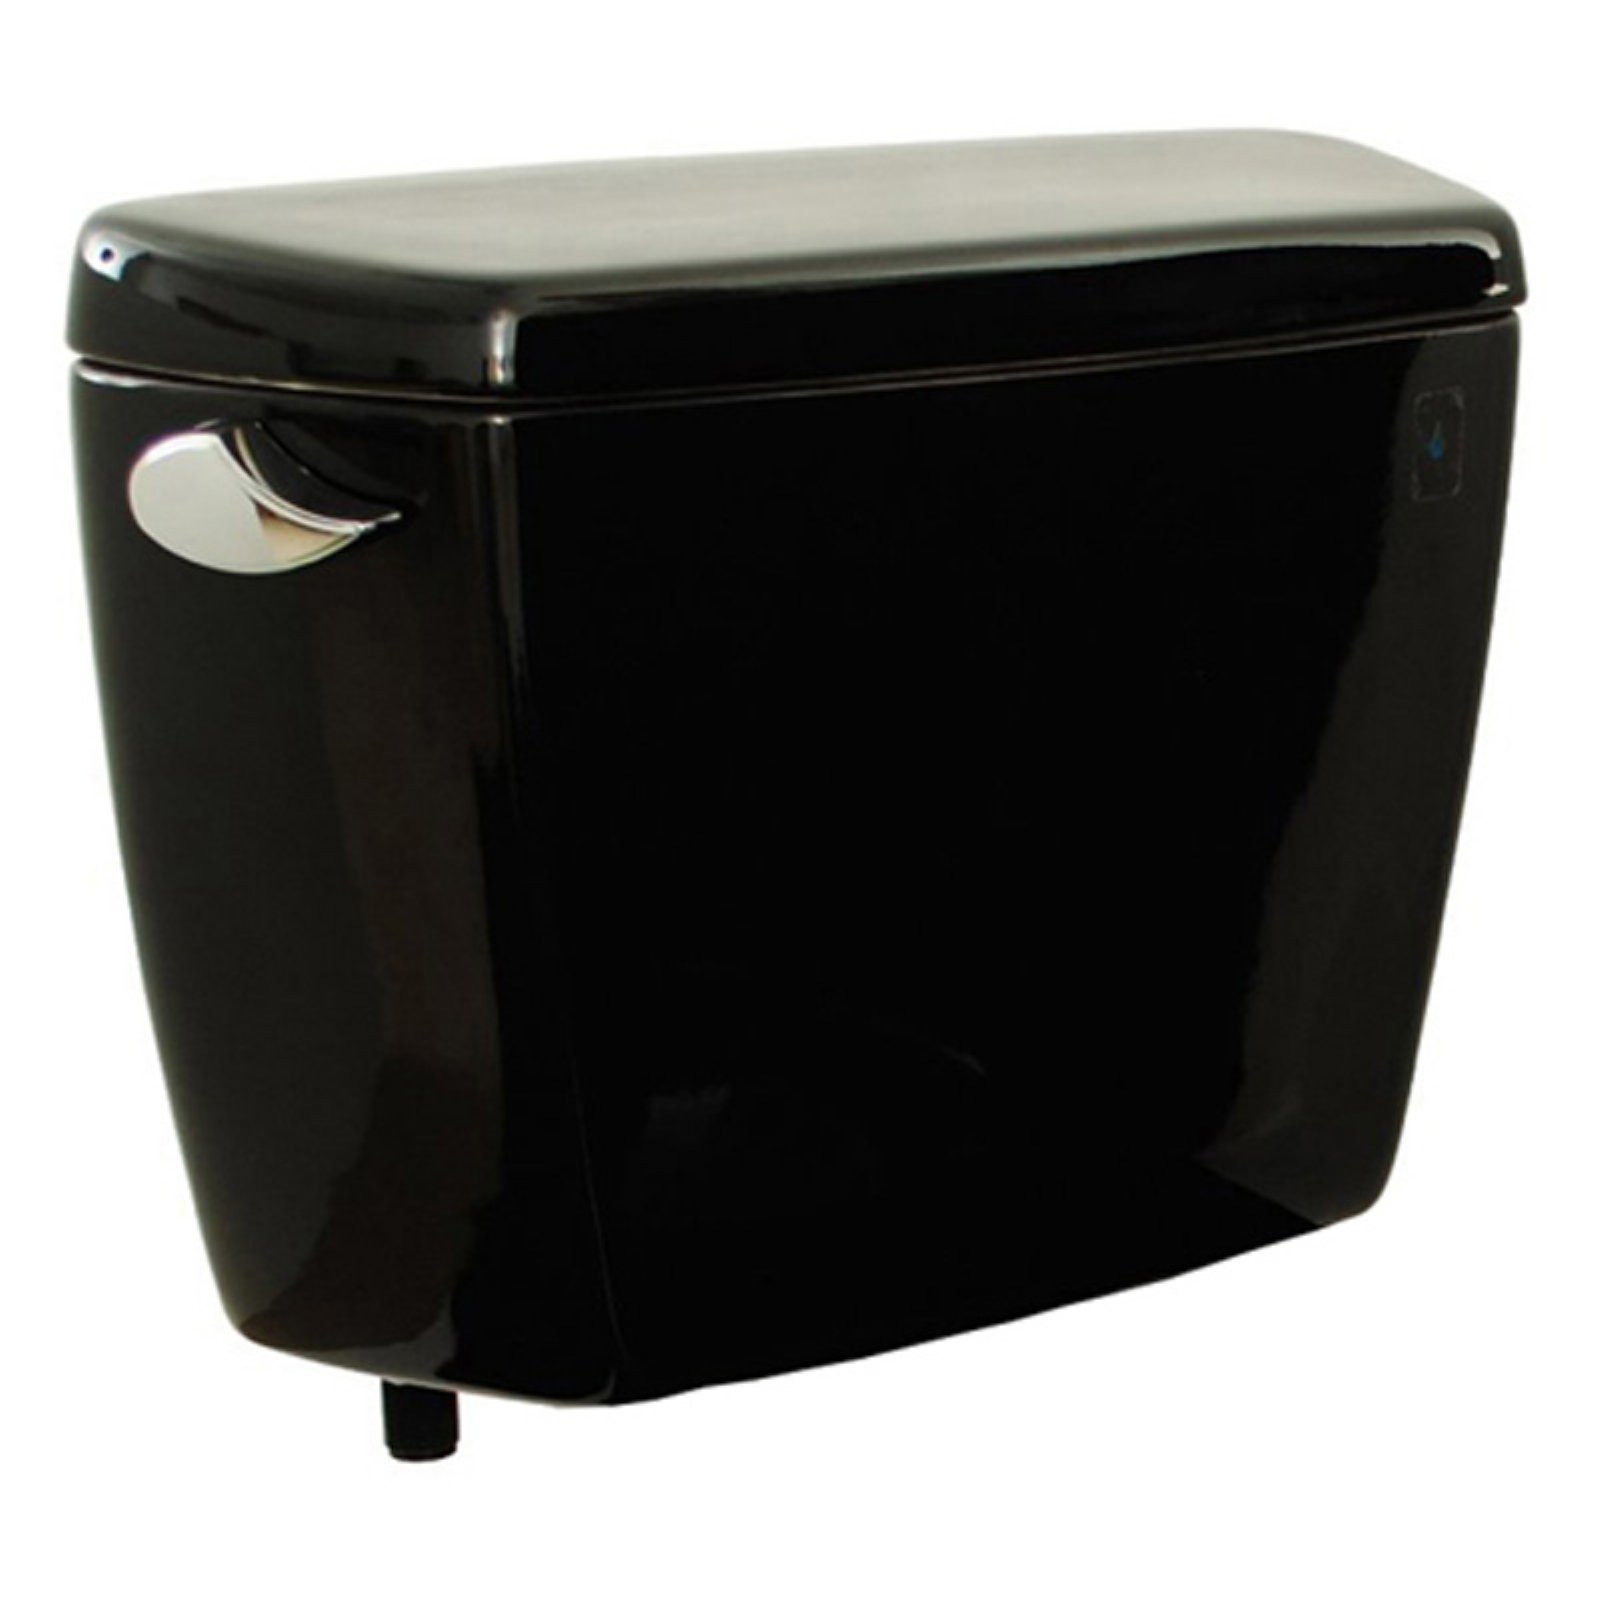 Toto Drake ST743S Toilet Tank - Walmart.com